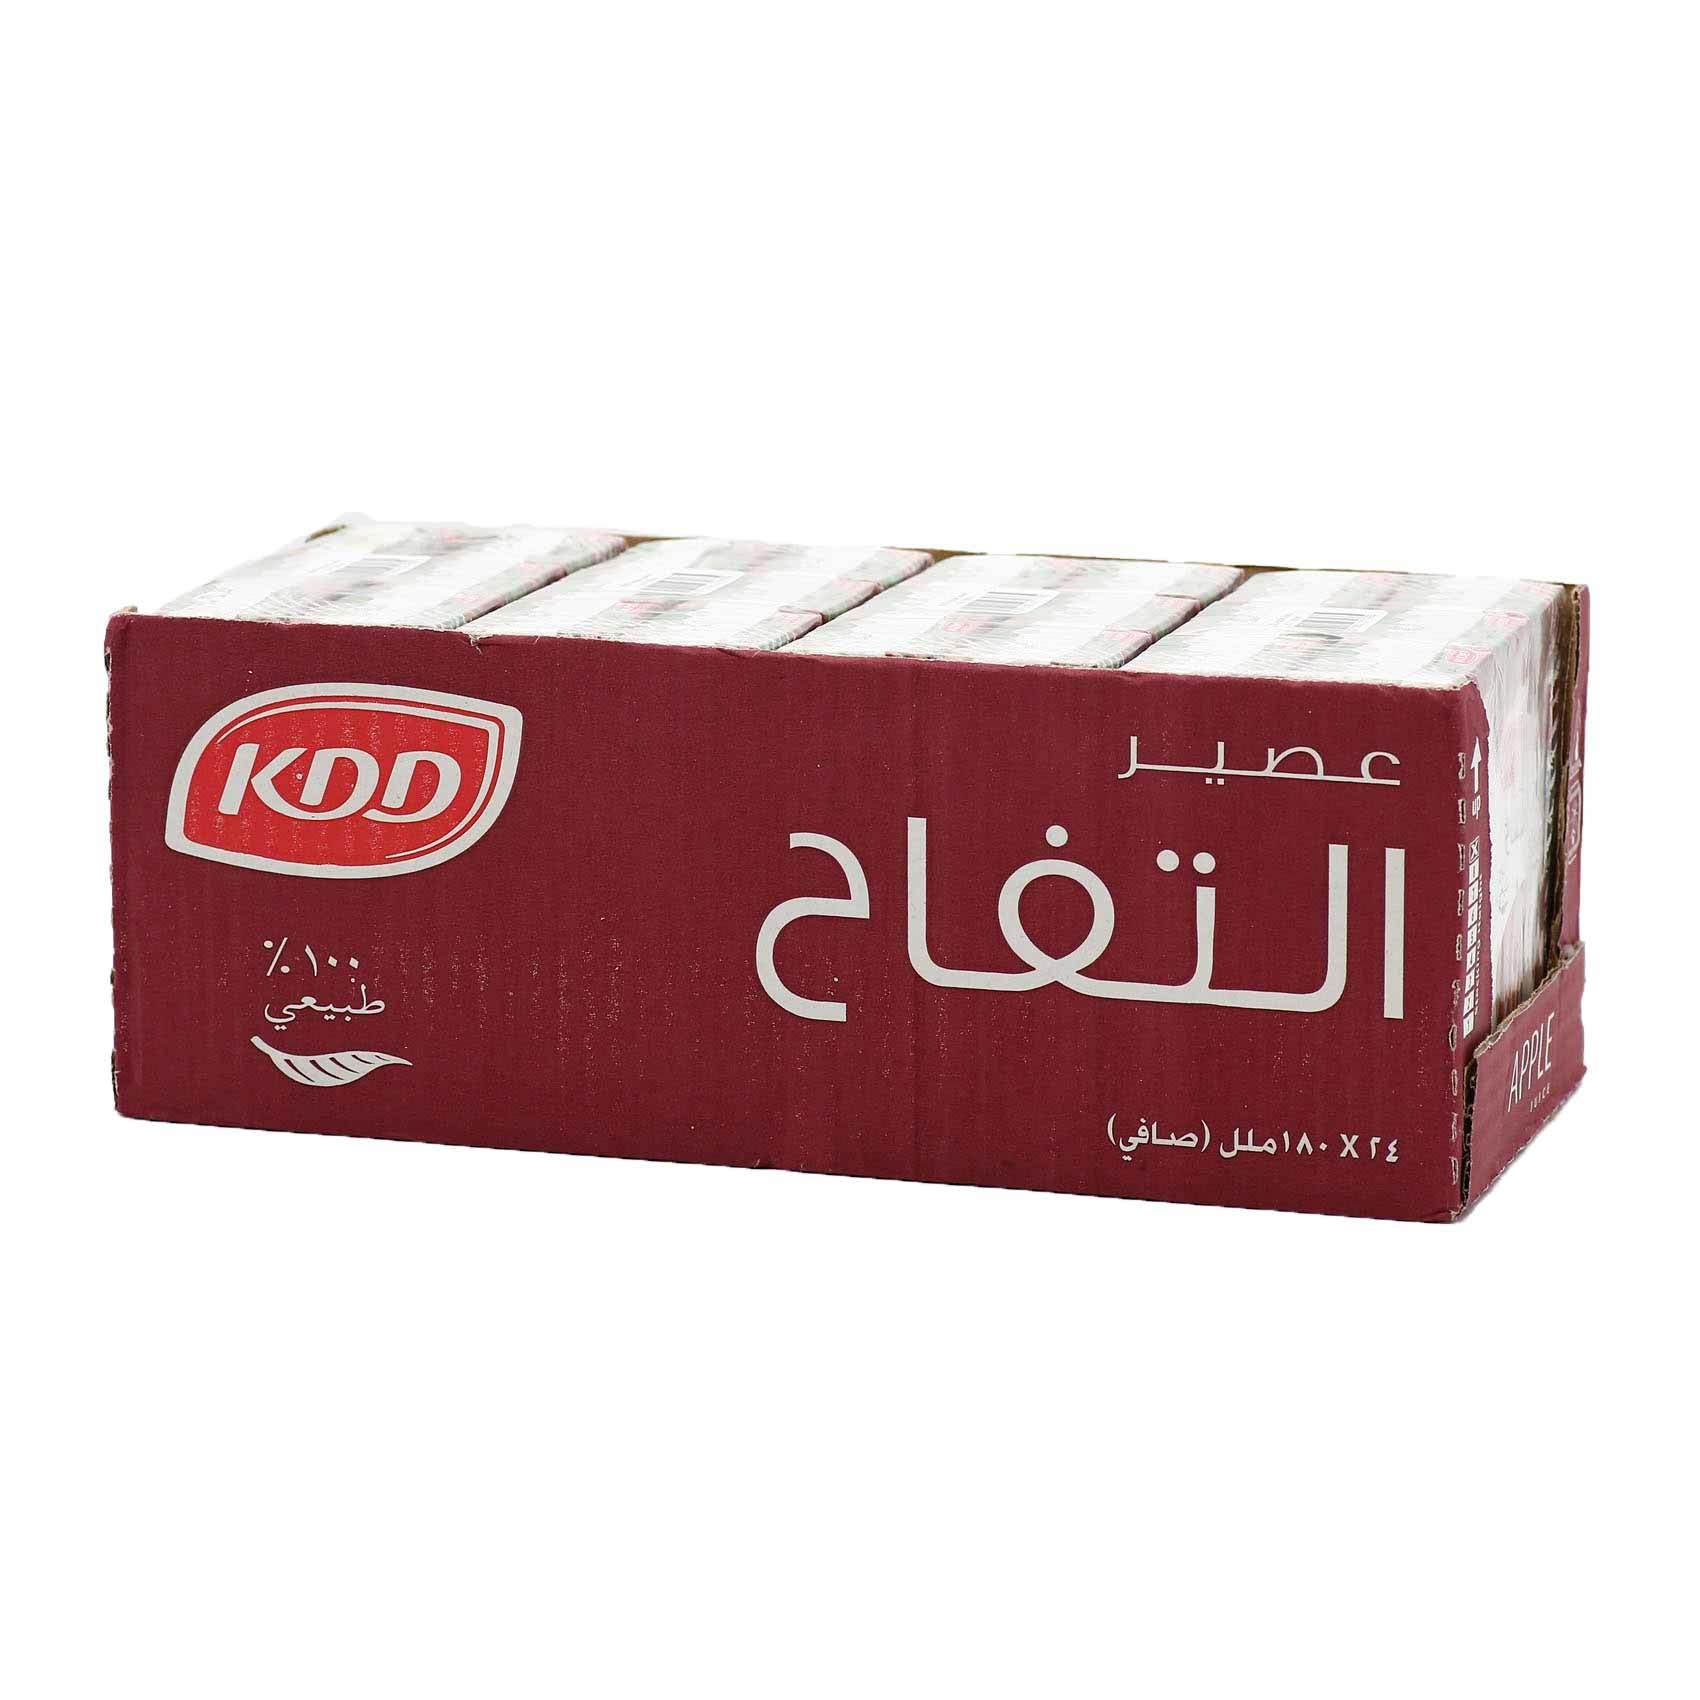 Buy Kdd Apple Juice 180 Ml X 24 Pieces Online Shop Beverages On Carrefour Saudi Arabia